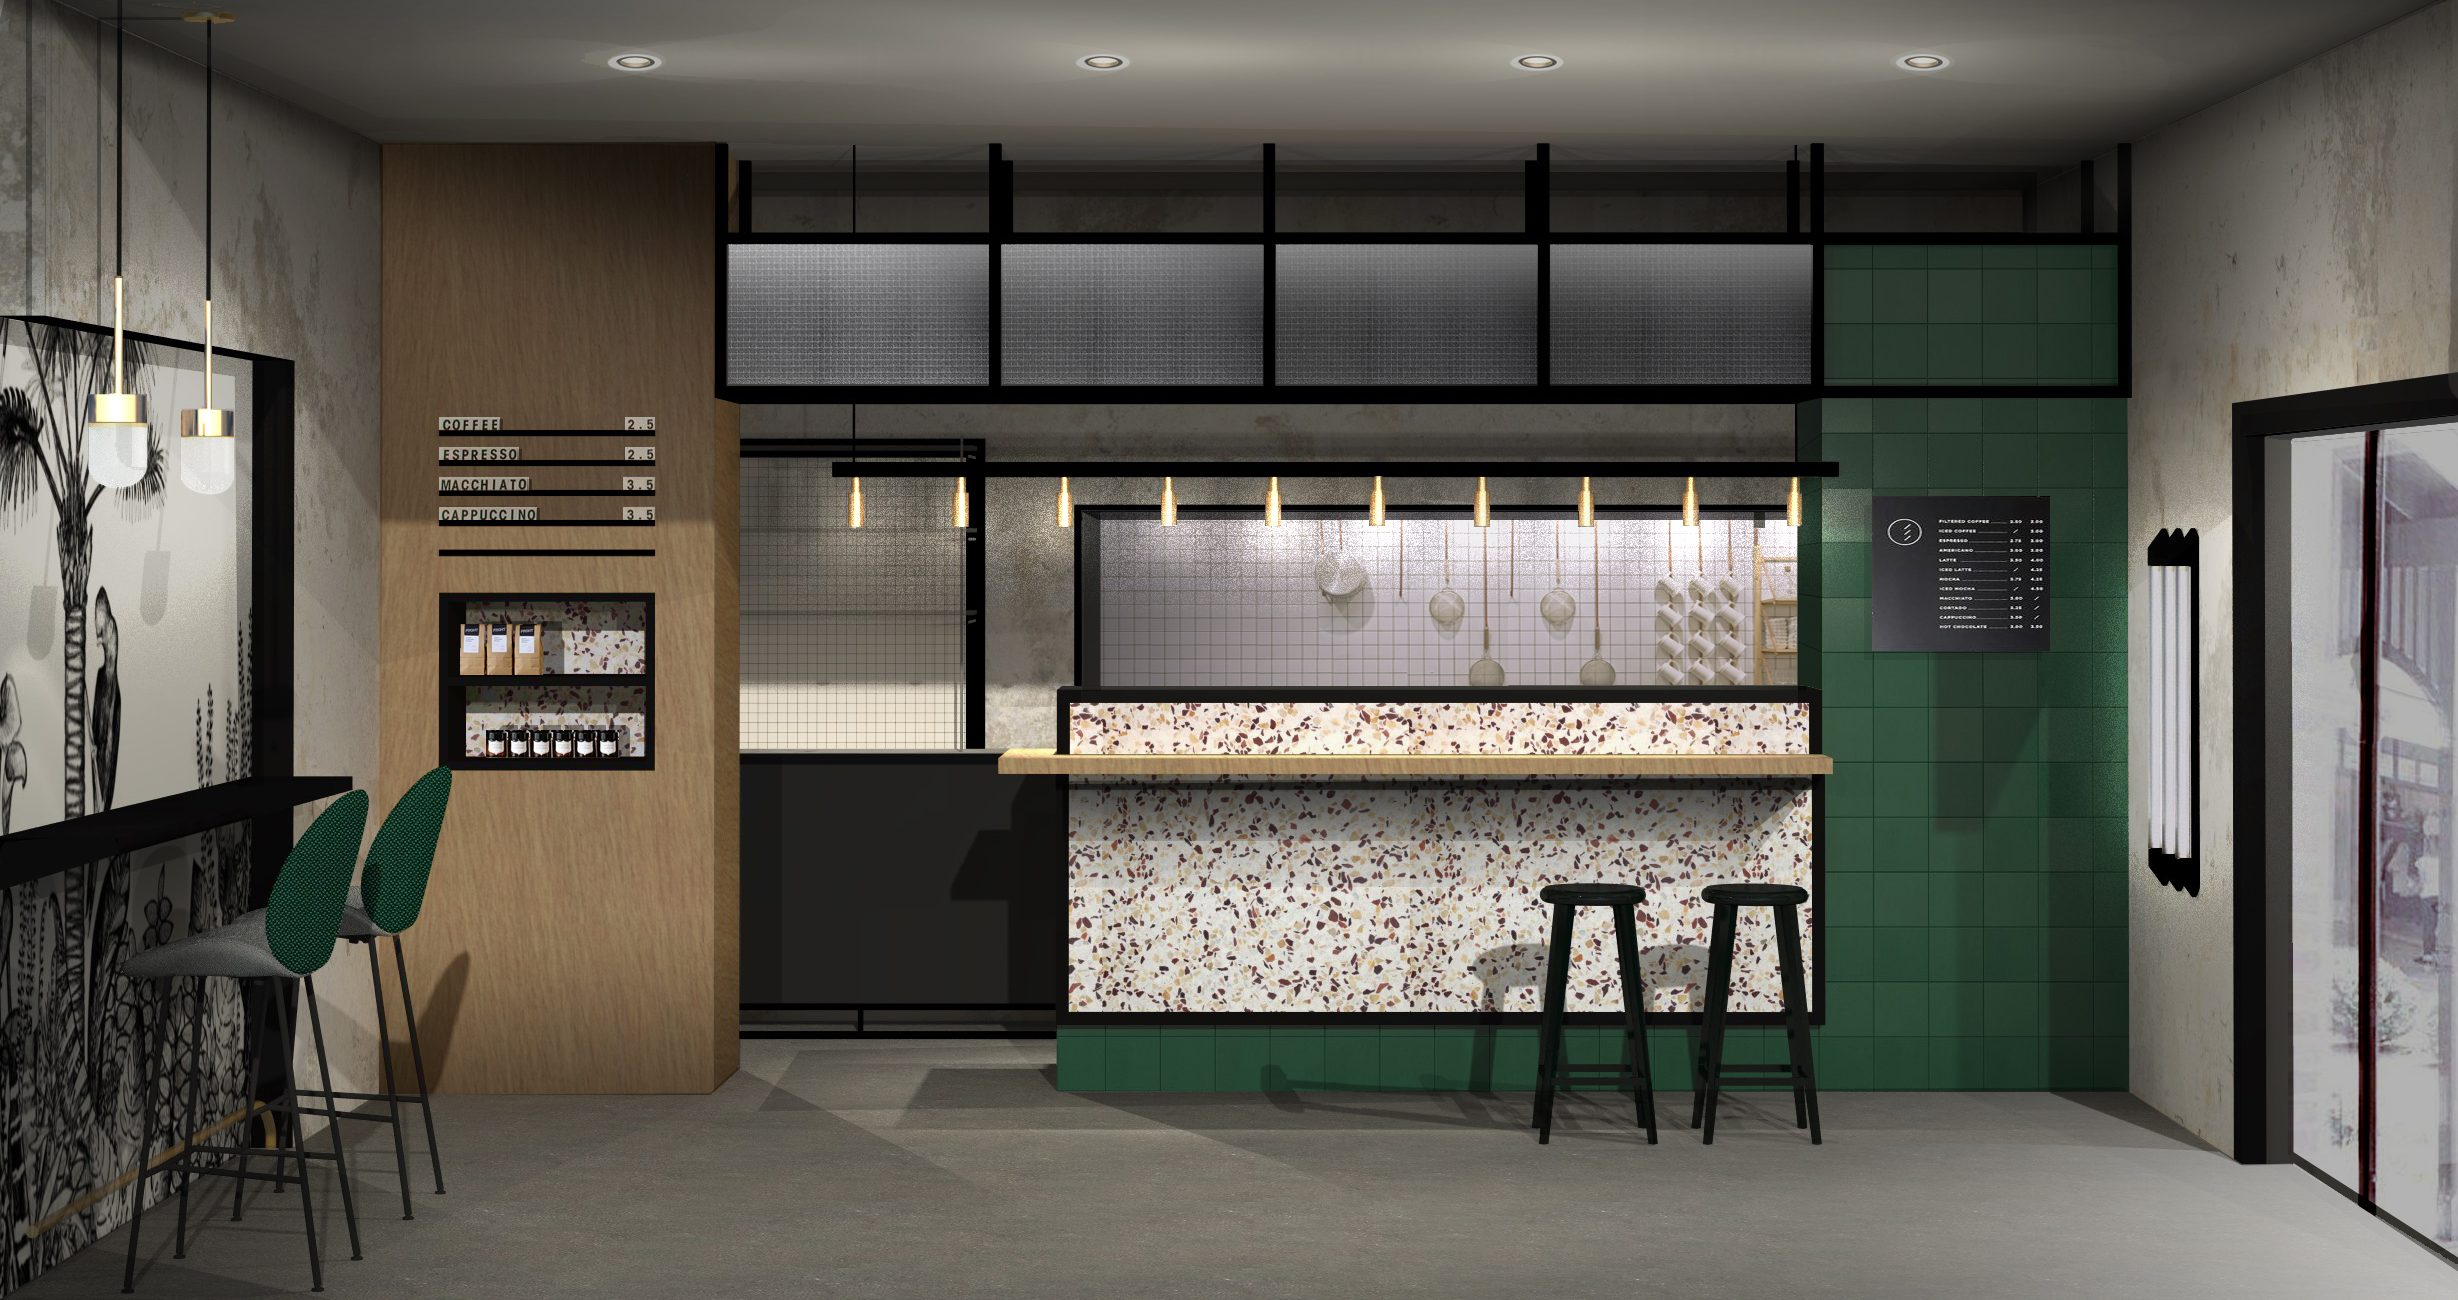 parisbrooklyn agence architecture interieure strasbourg architecture commerciales design global design despace cafe restaurant boutique amenagement strasbourg